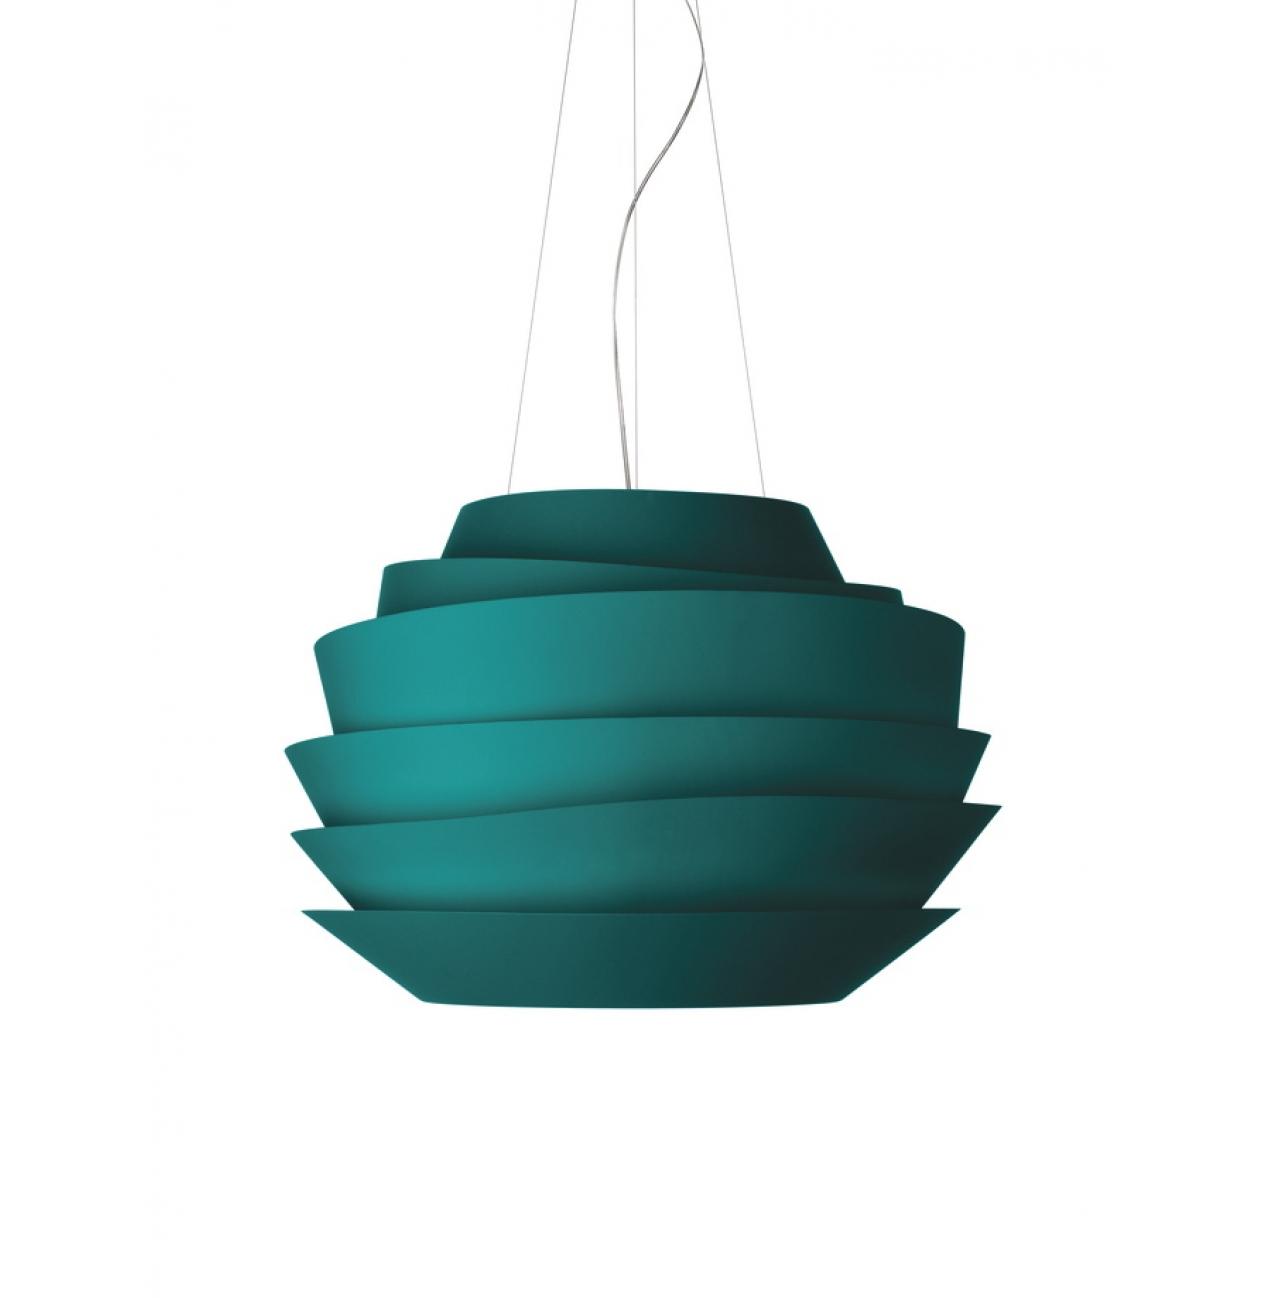 foscarini hanglamp le soleil versteeg lichtstudio. Black Bedroom Furniture Sets. Home Design Ideas